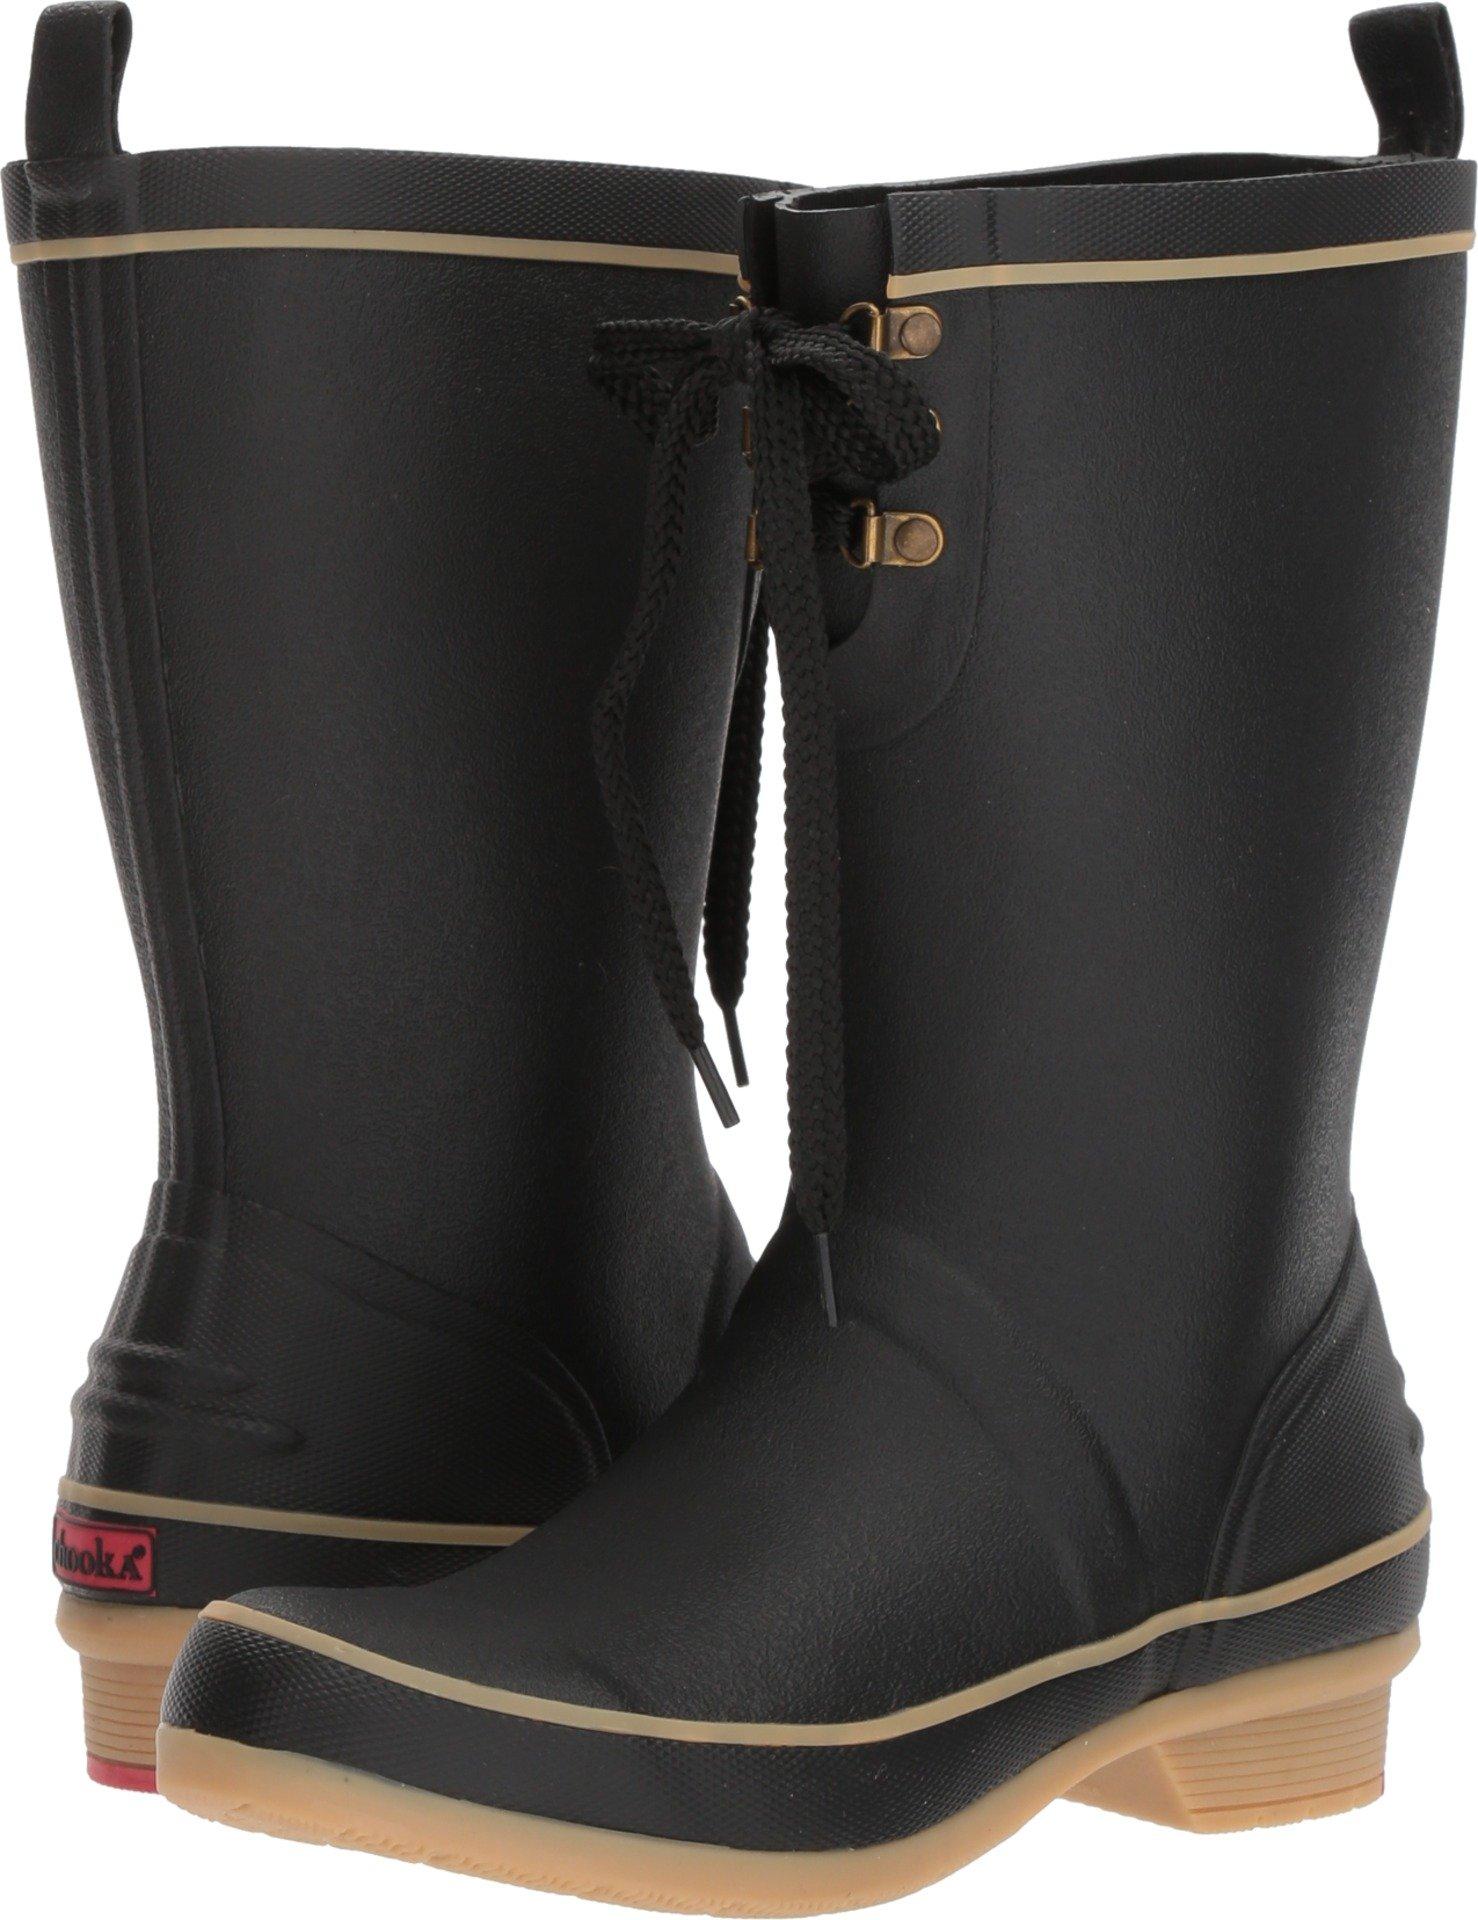 Chooka Women's Whidbey Rain Boots Black 8 M US